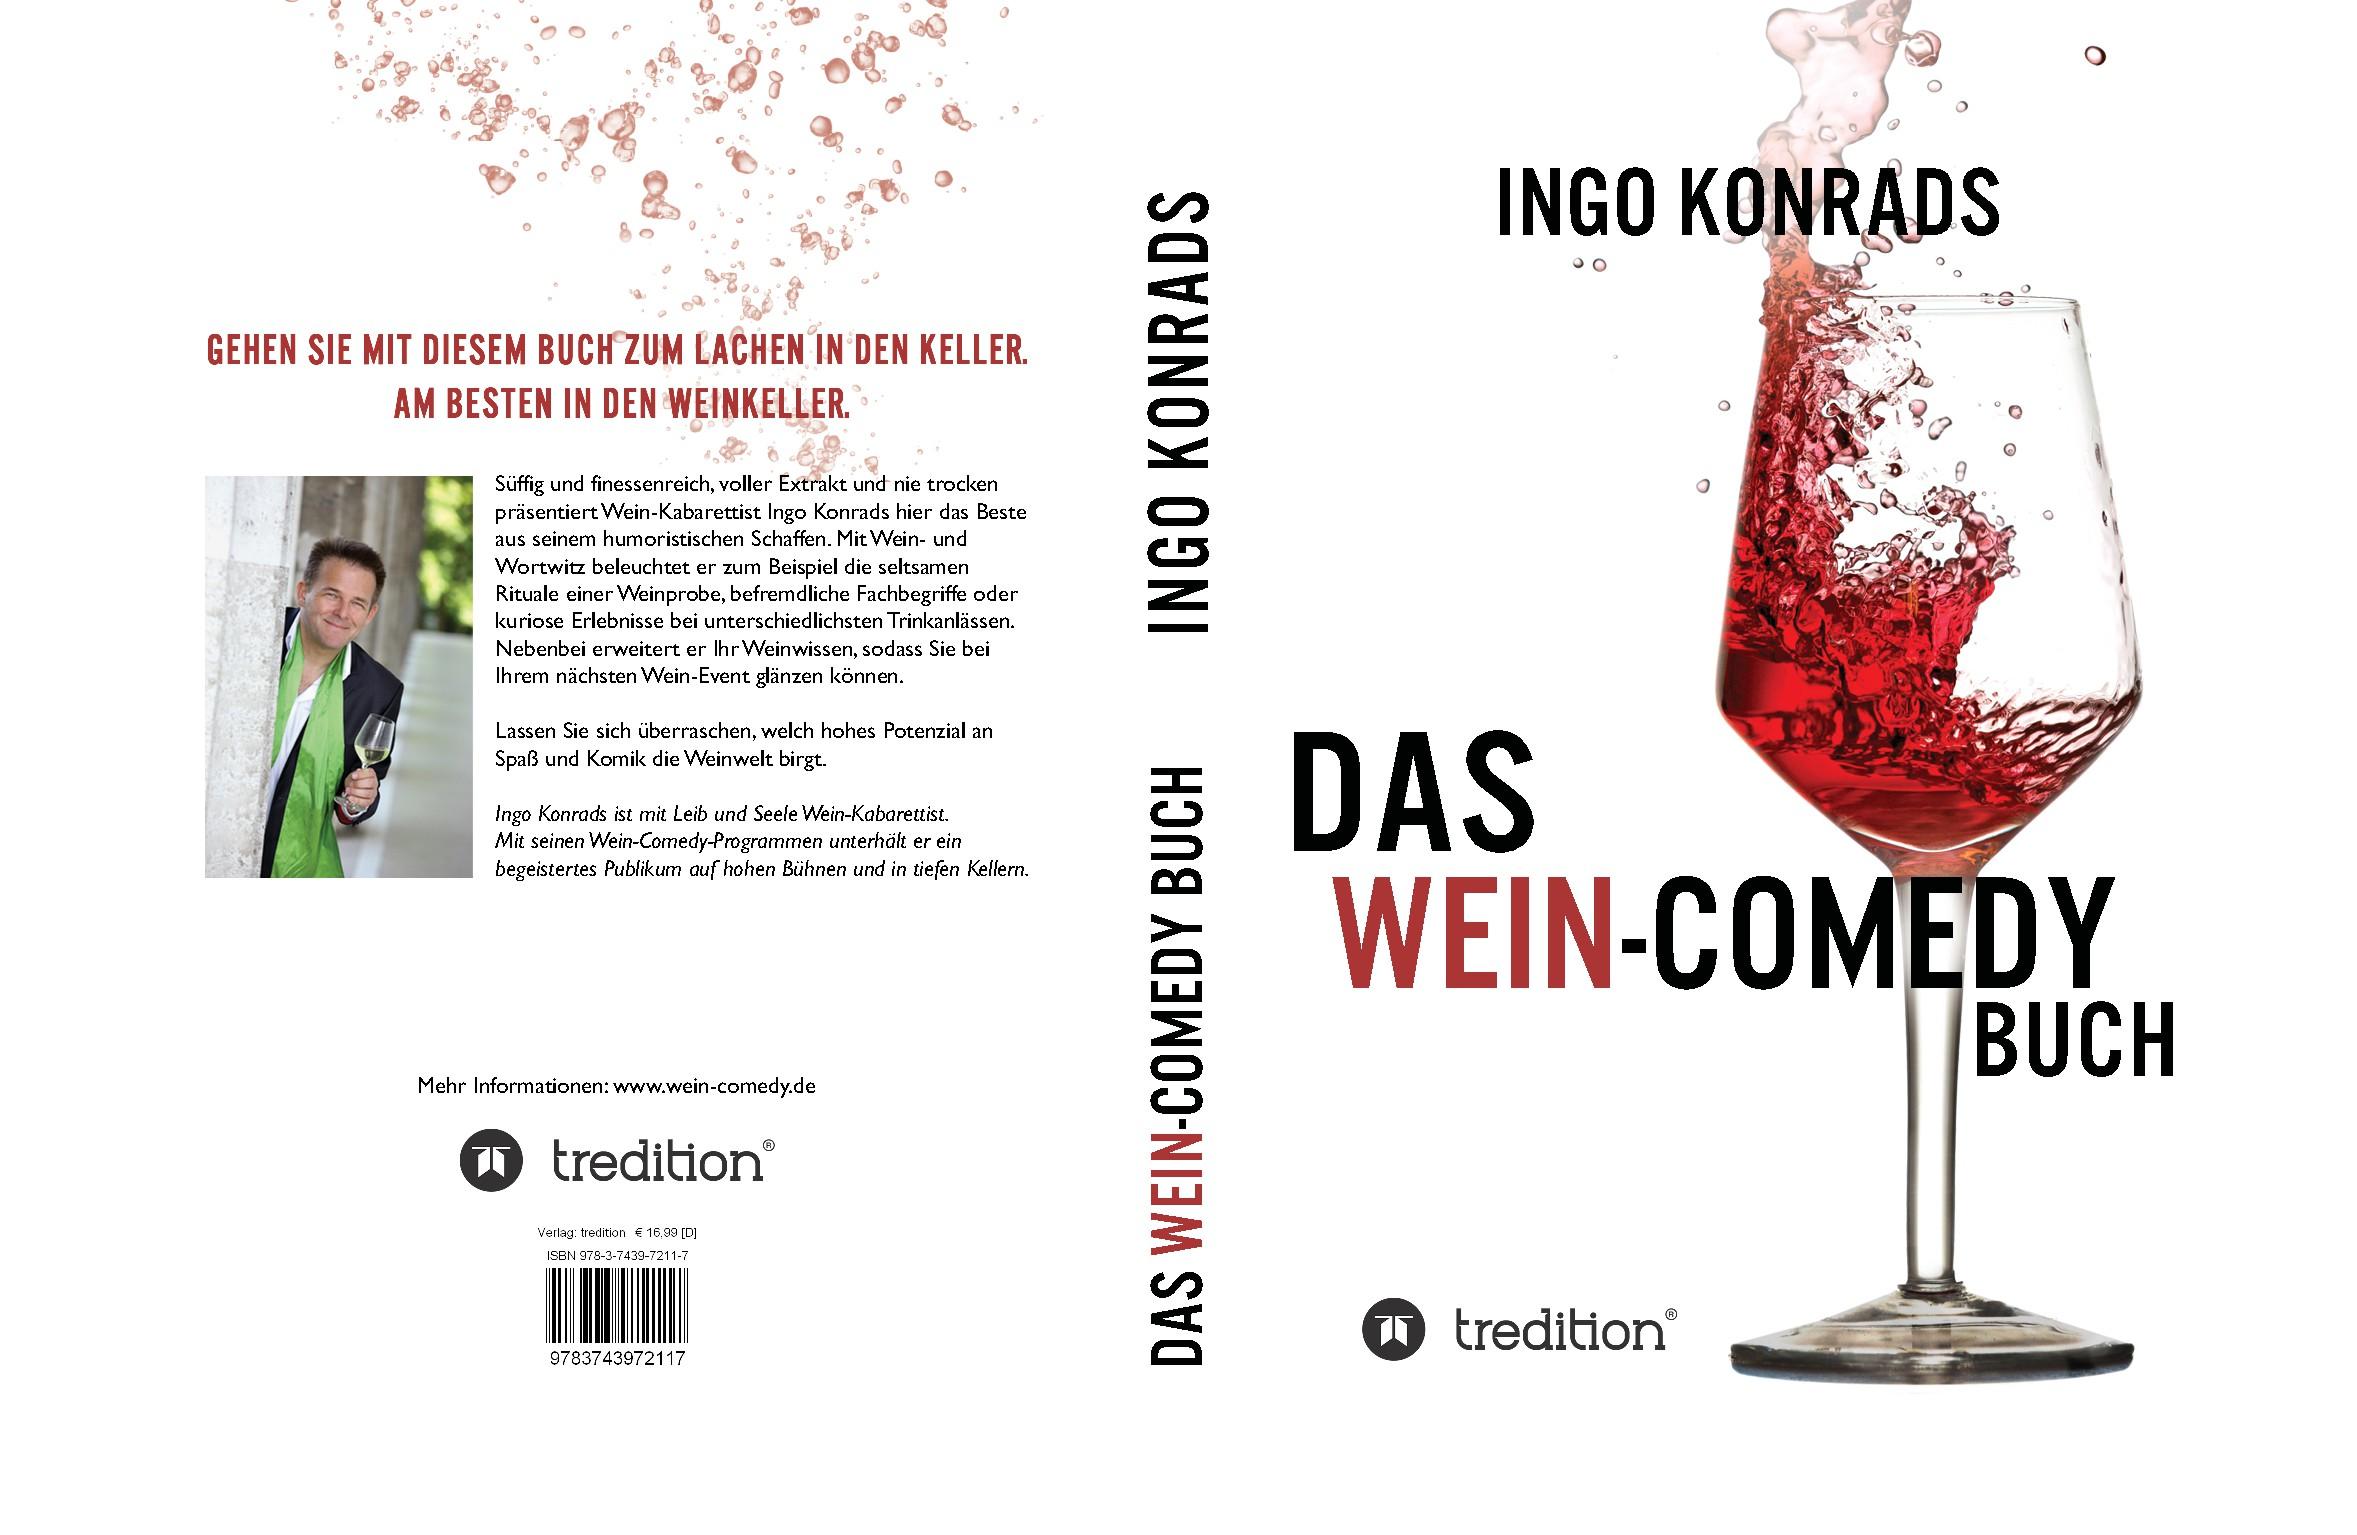 Create a book cover of a Wine-Comedy book